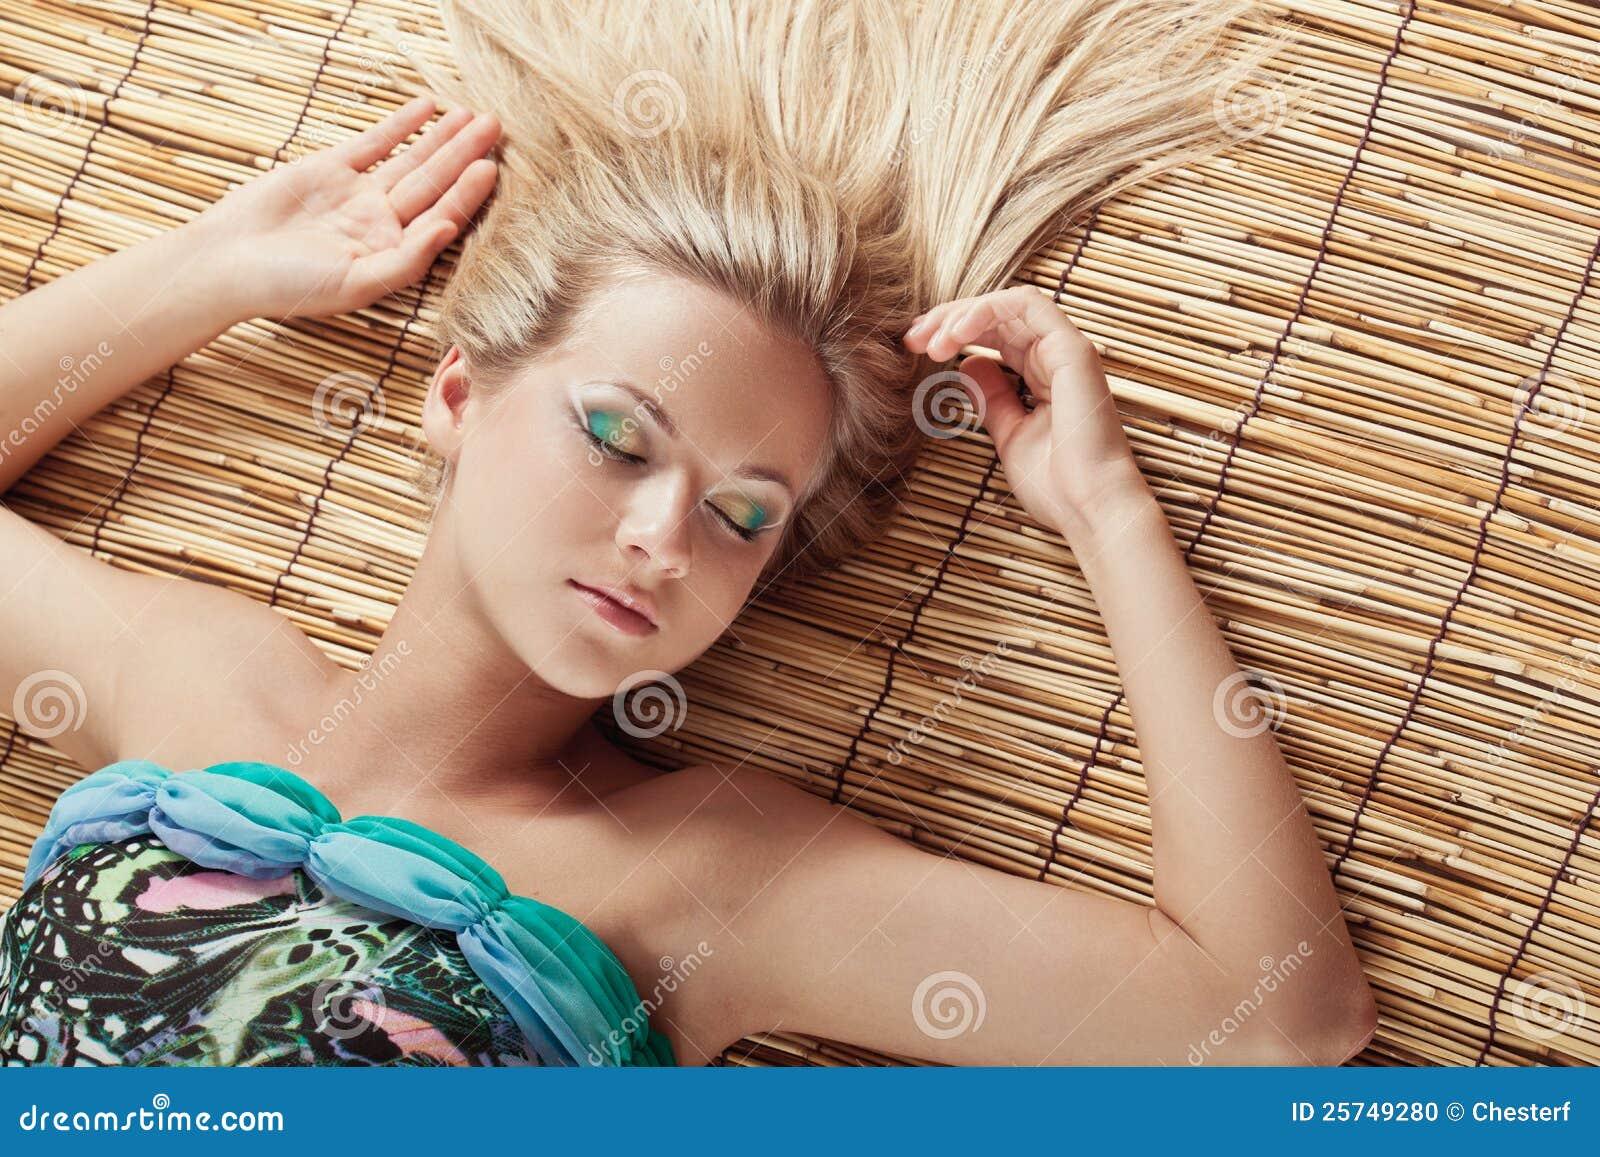 Sleeping woman laying on bamboo mat